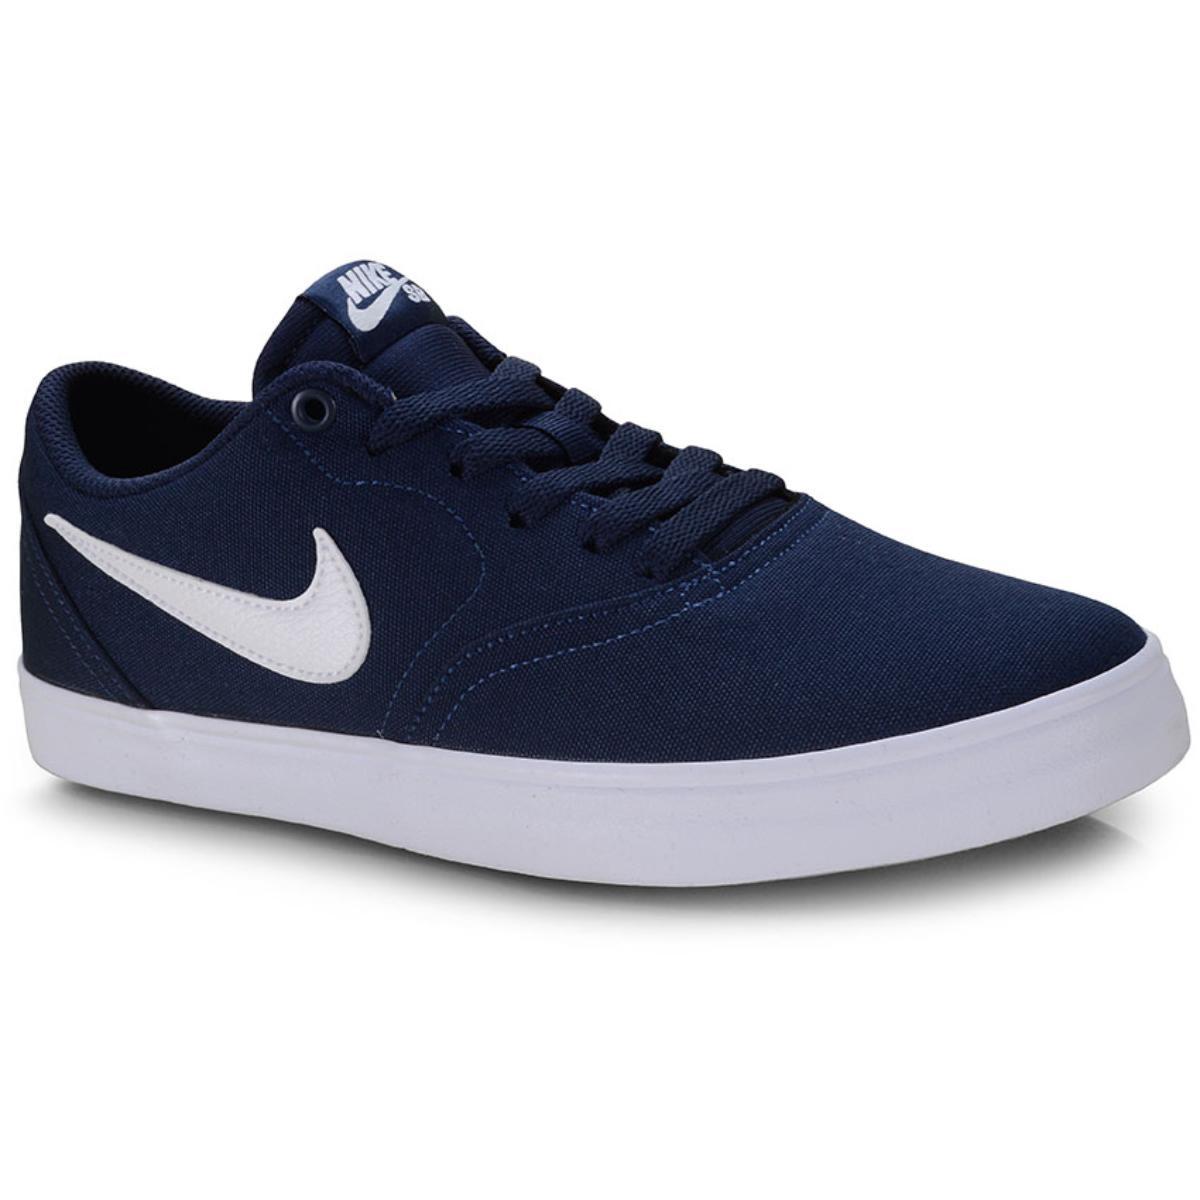 Tênis Masculino Nike 843896-404 sb Check Solar Cnvs Marinho/branco